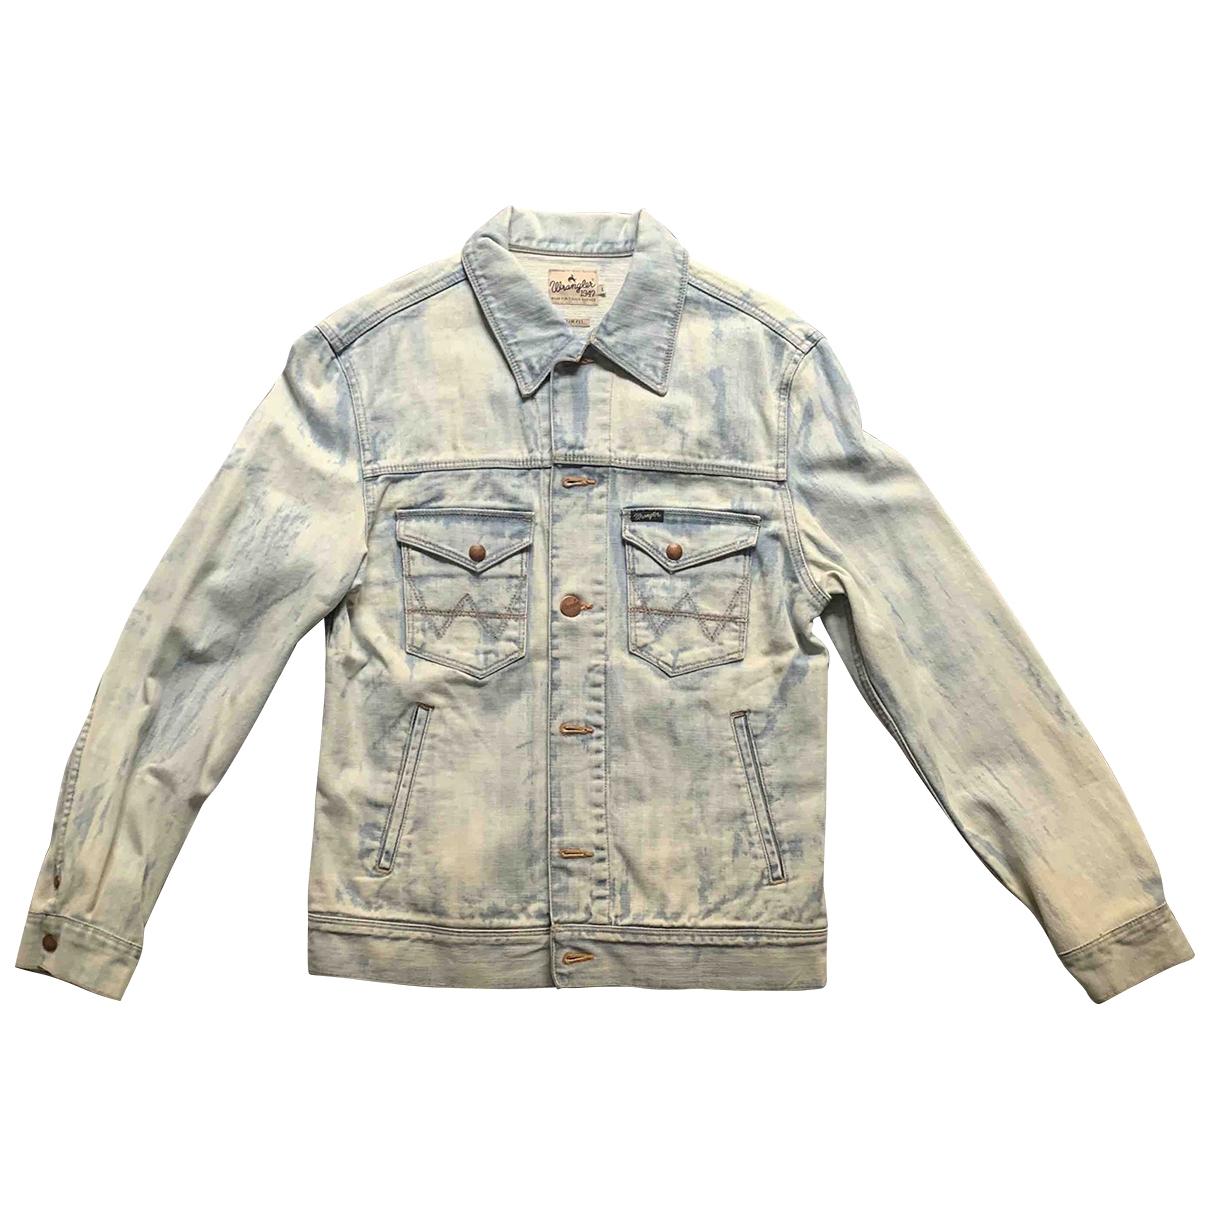 Wrangler \N Jacke in  Blau Denim - Jeans